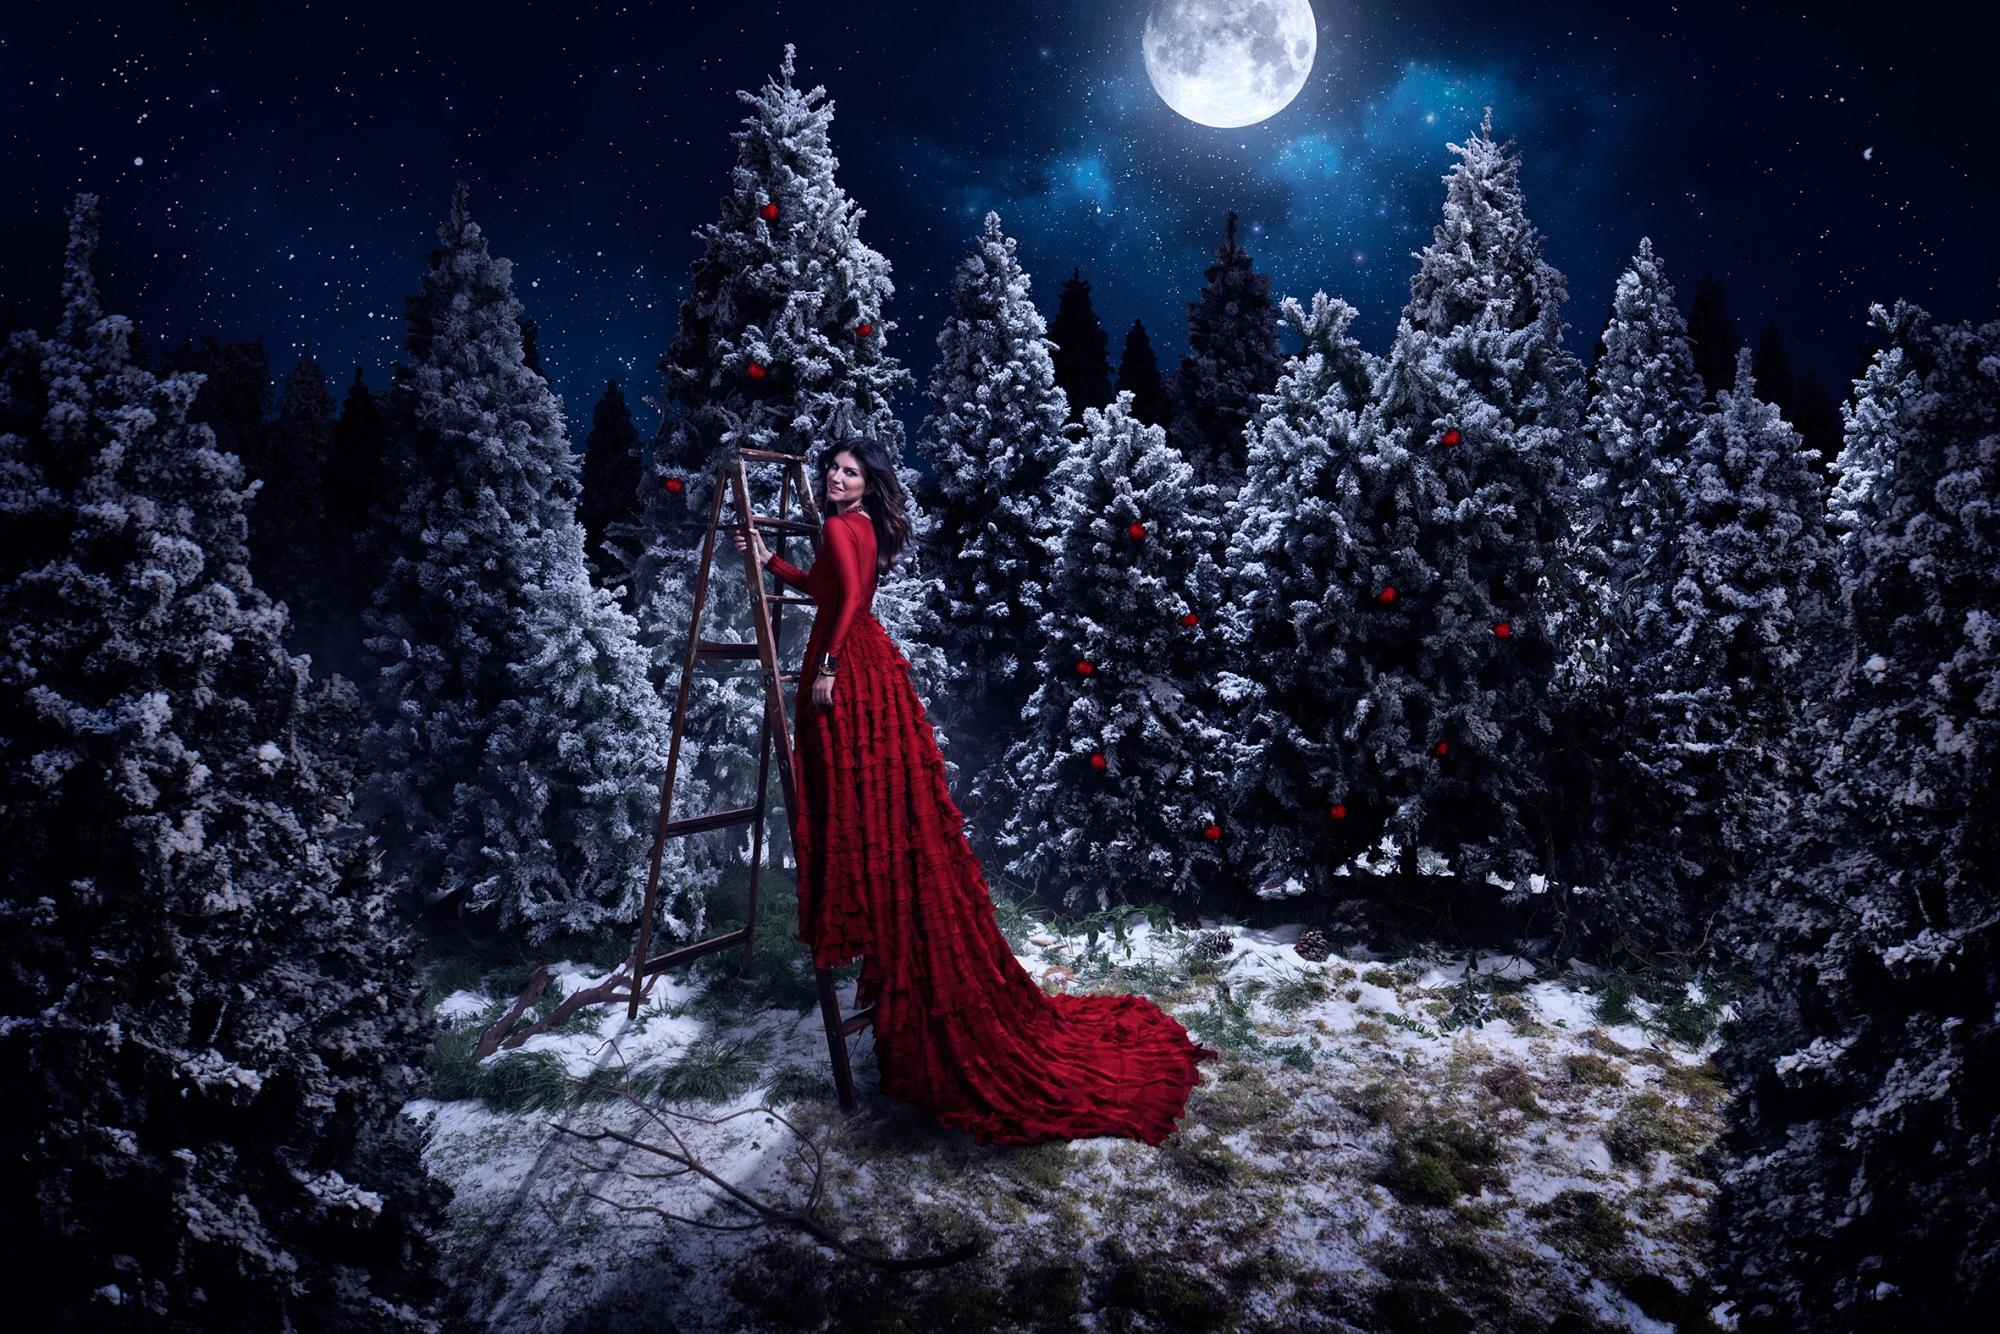 Laura Xmas , la Pausini canta la magia del Natale